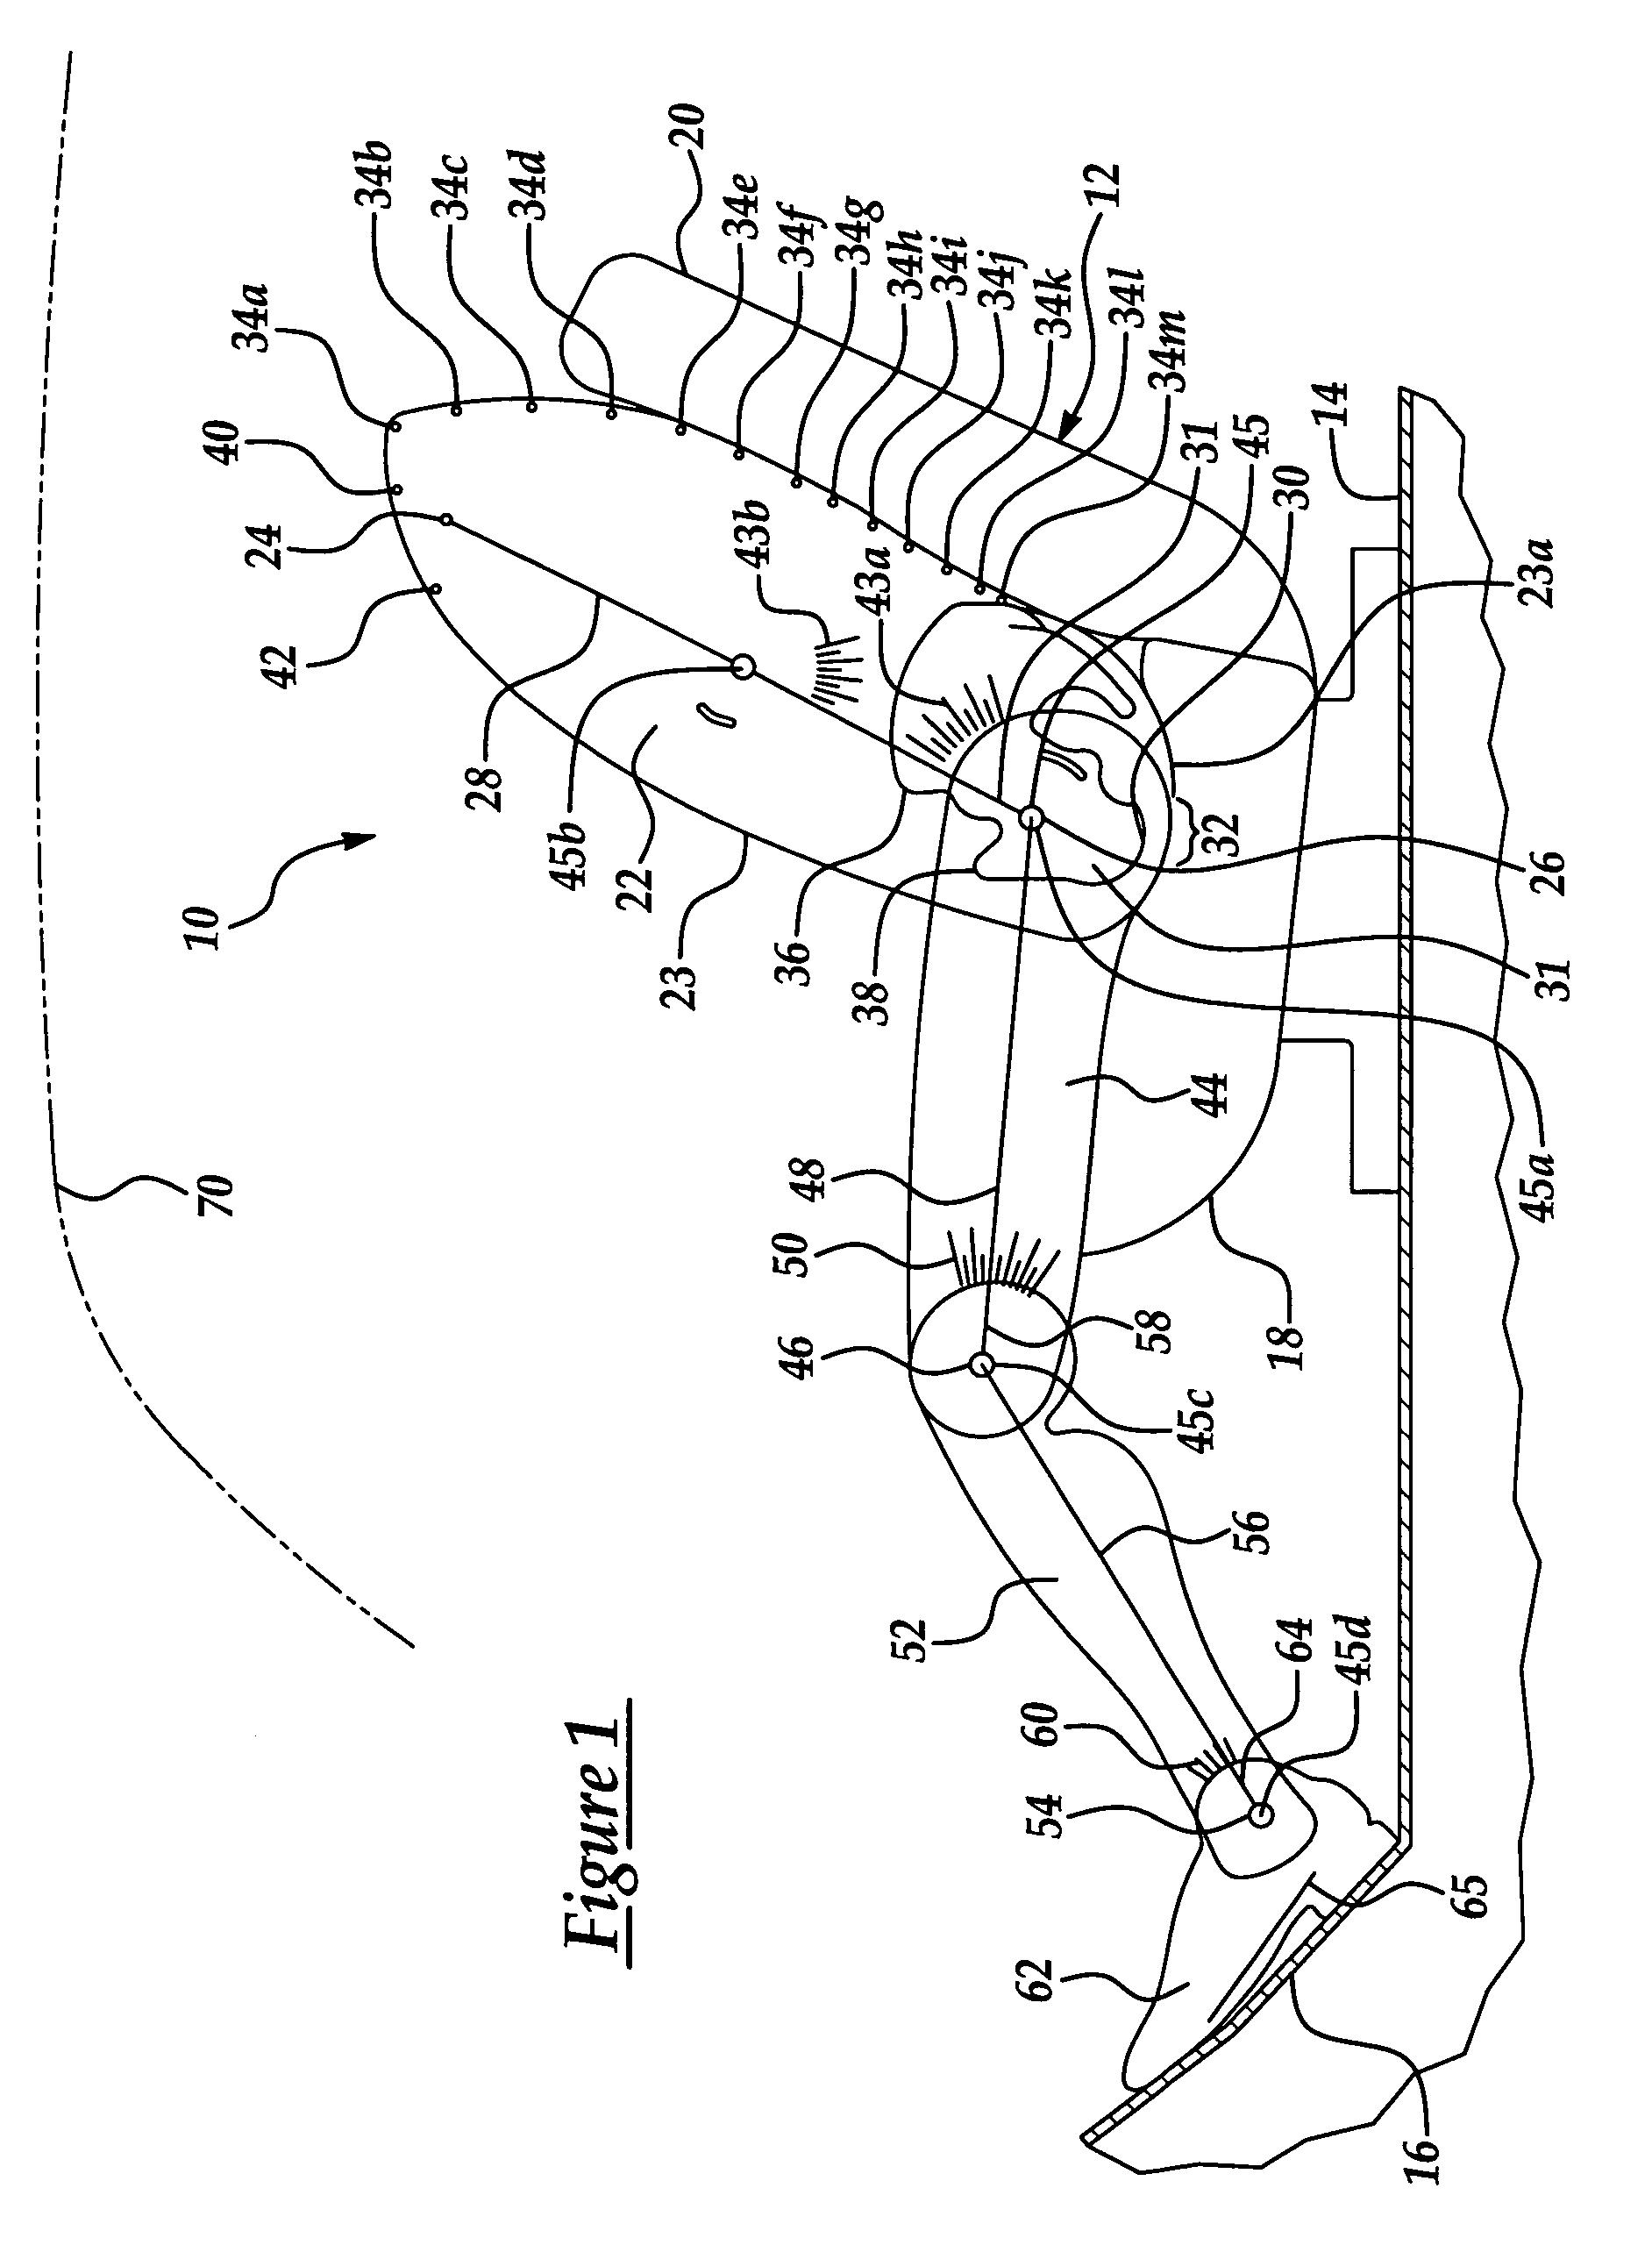 patent us7347114 template google patentsuche. Black Bedroom Furniture Sets. Home Design Ideas